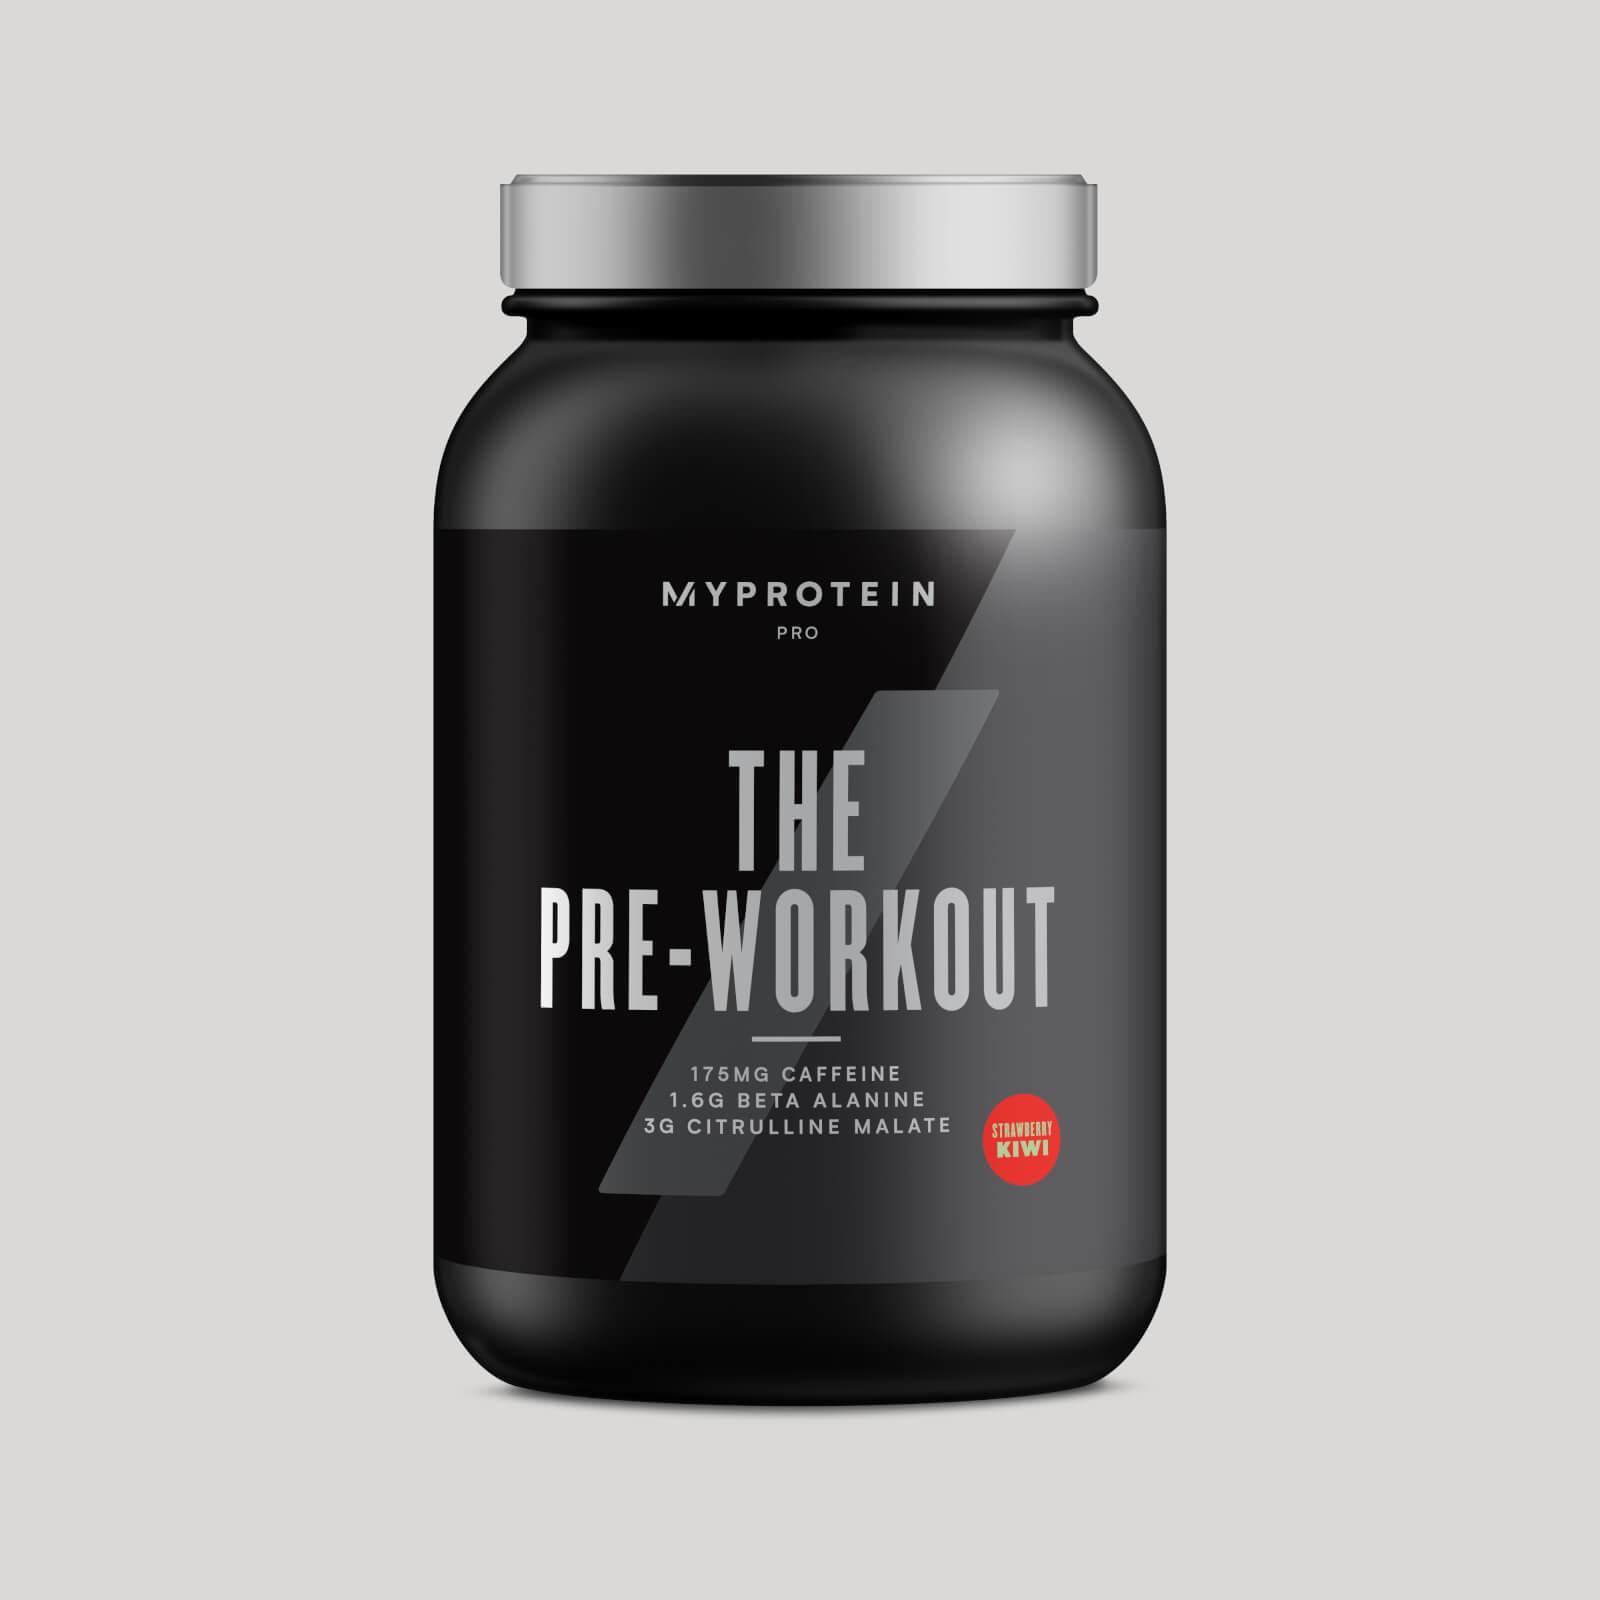 THE Pre-Workout - 30servings - Fraise - Kiwi